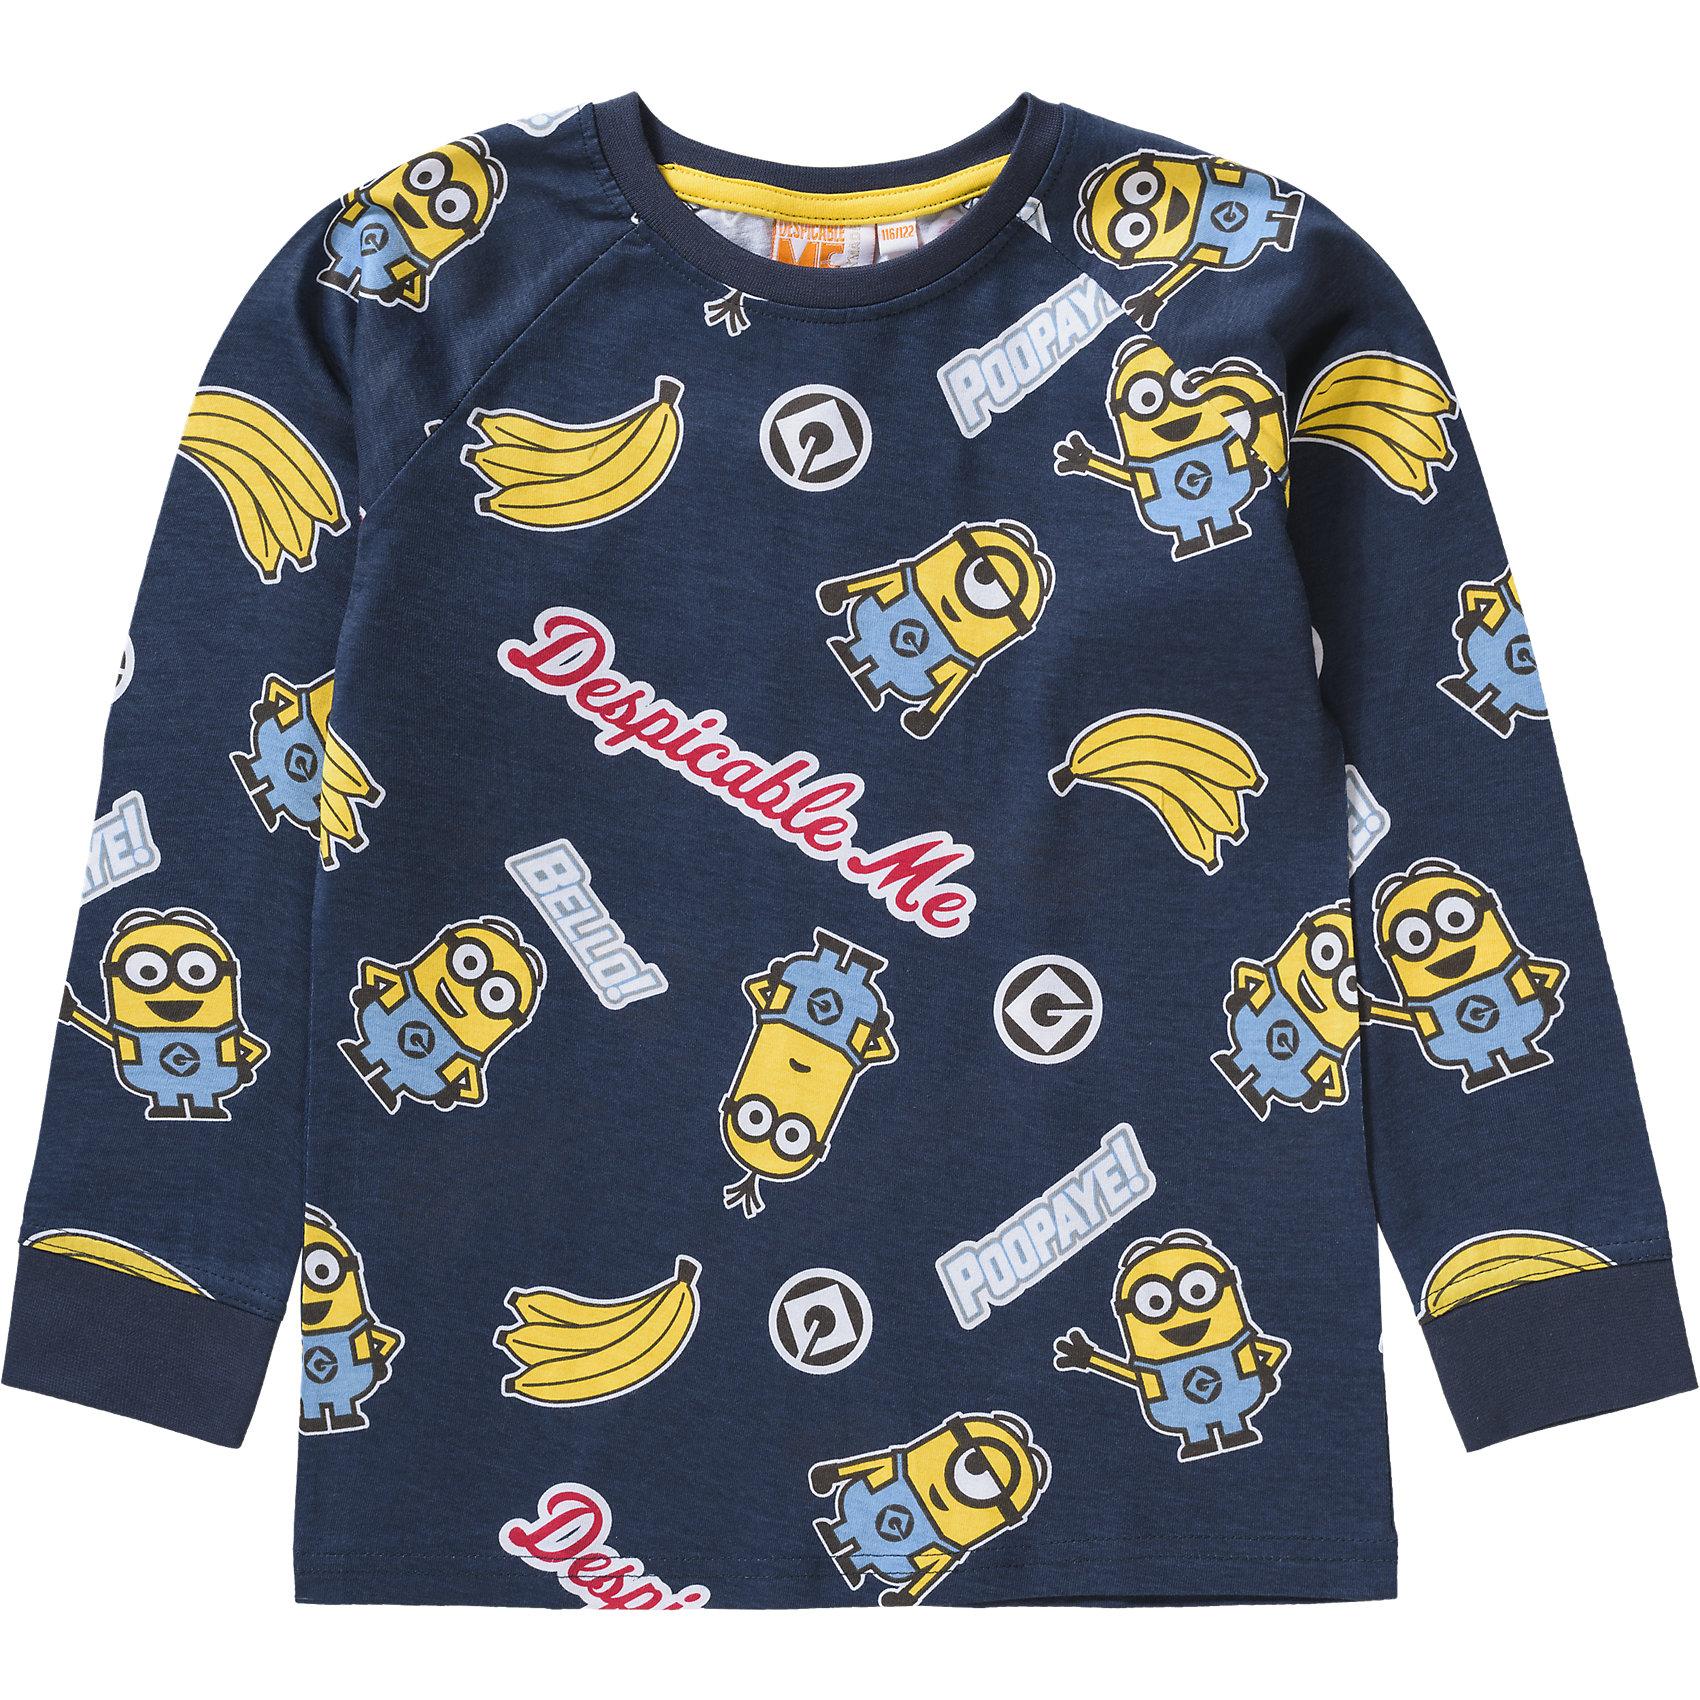 Neu-Minions-Schlafanzug-fuer-Jungen-6064754-fuer-Jungen-blau-grau